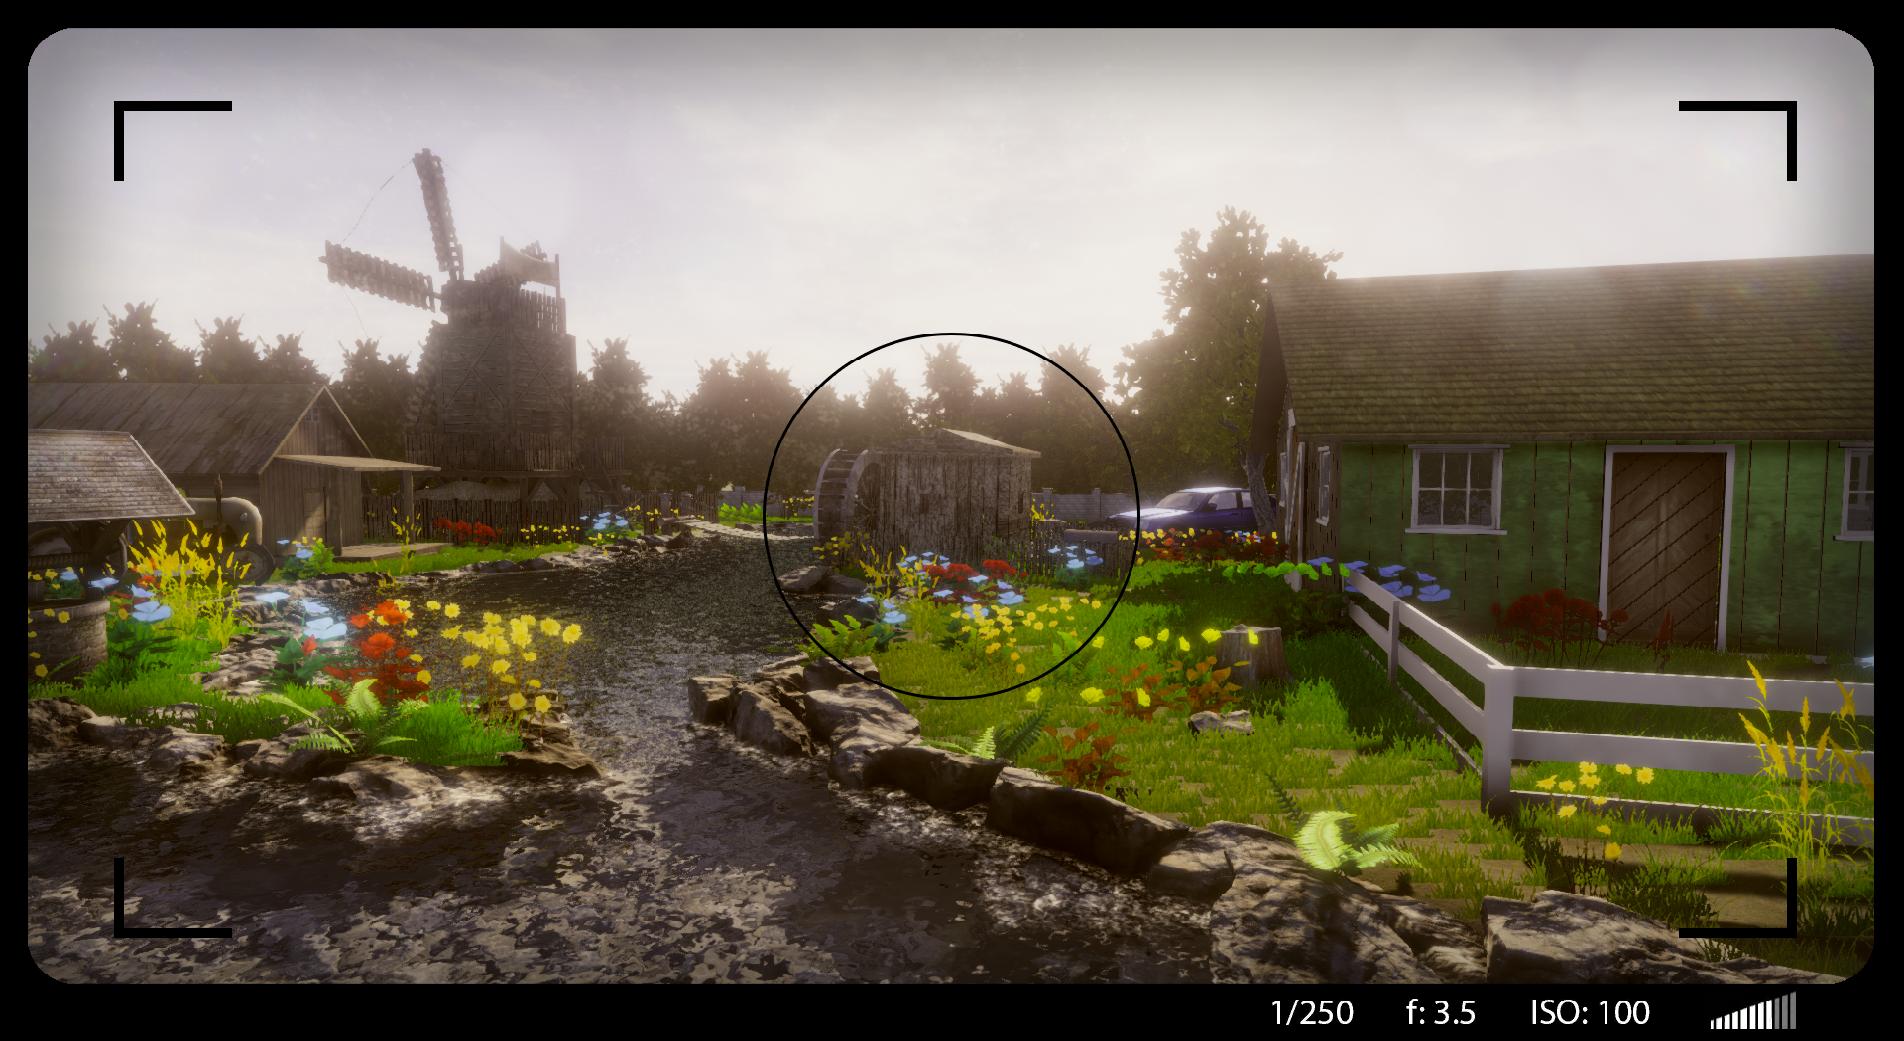 Unity 2018 Level Design | Farm scene